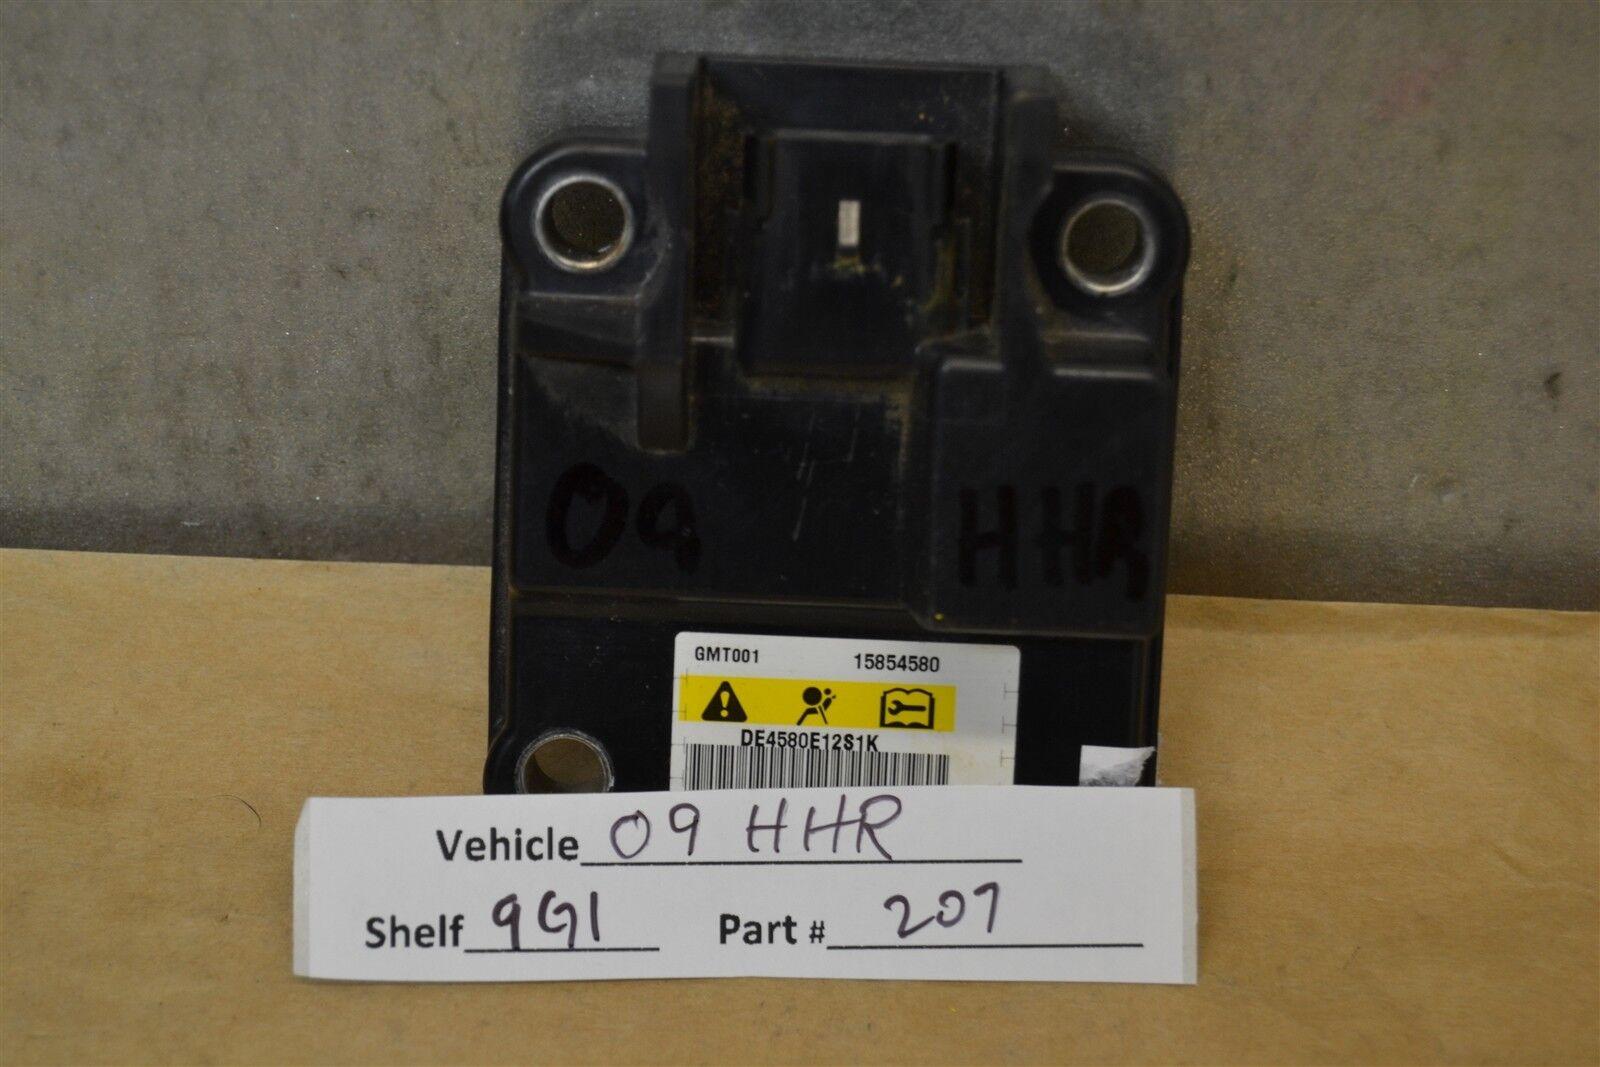 2009 Chevrolet HHR Air Bag System Control Unit 15854580 Module 07 9G1